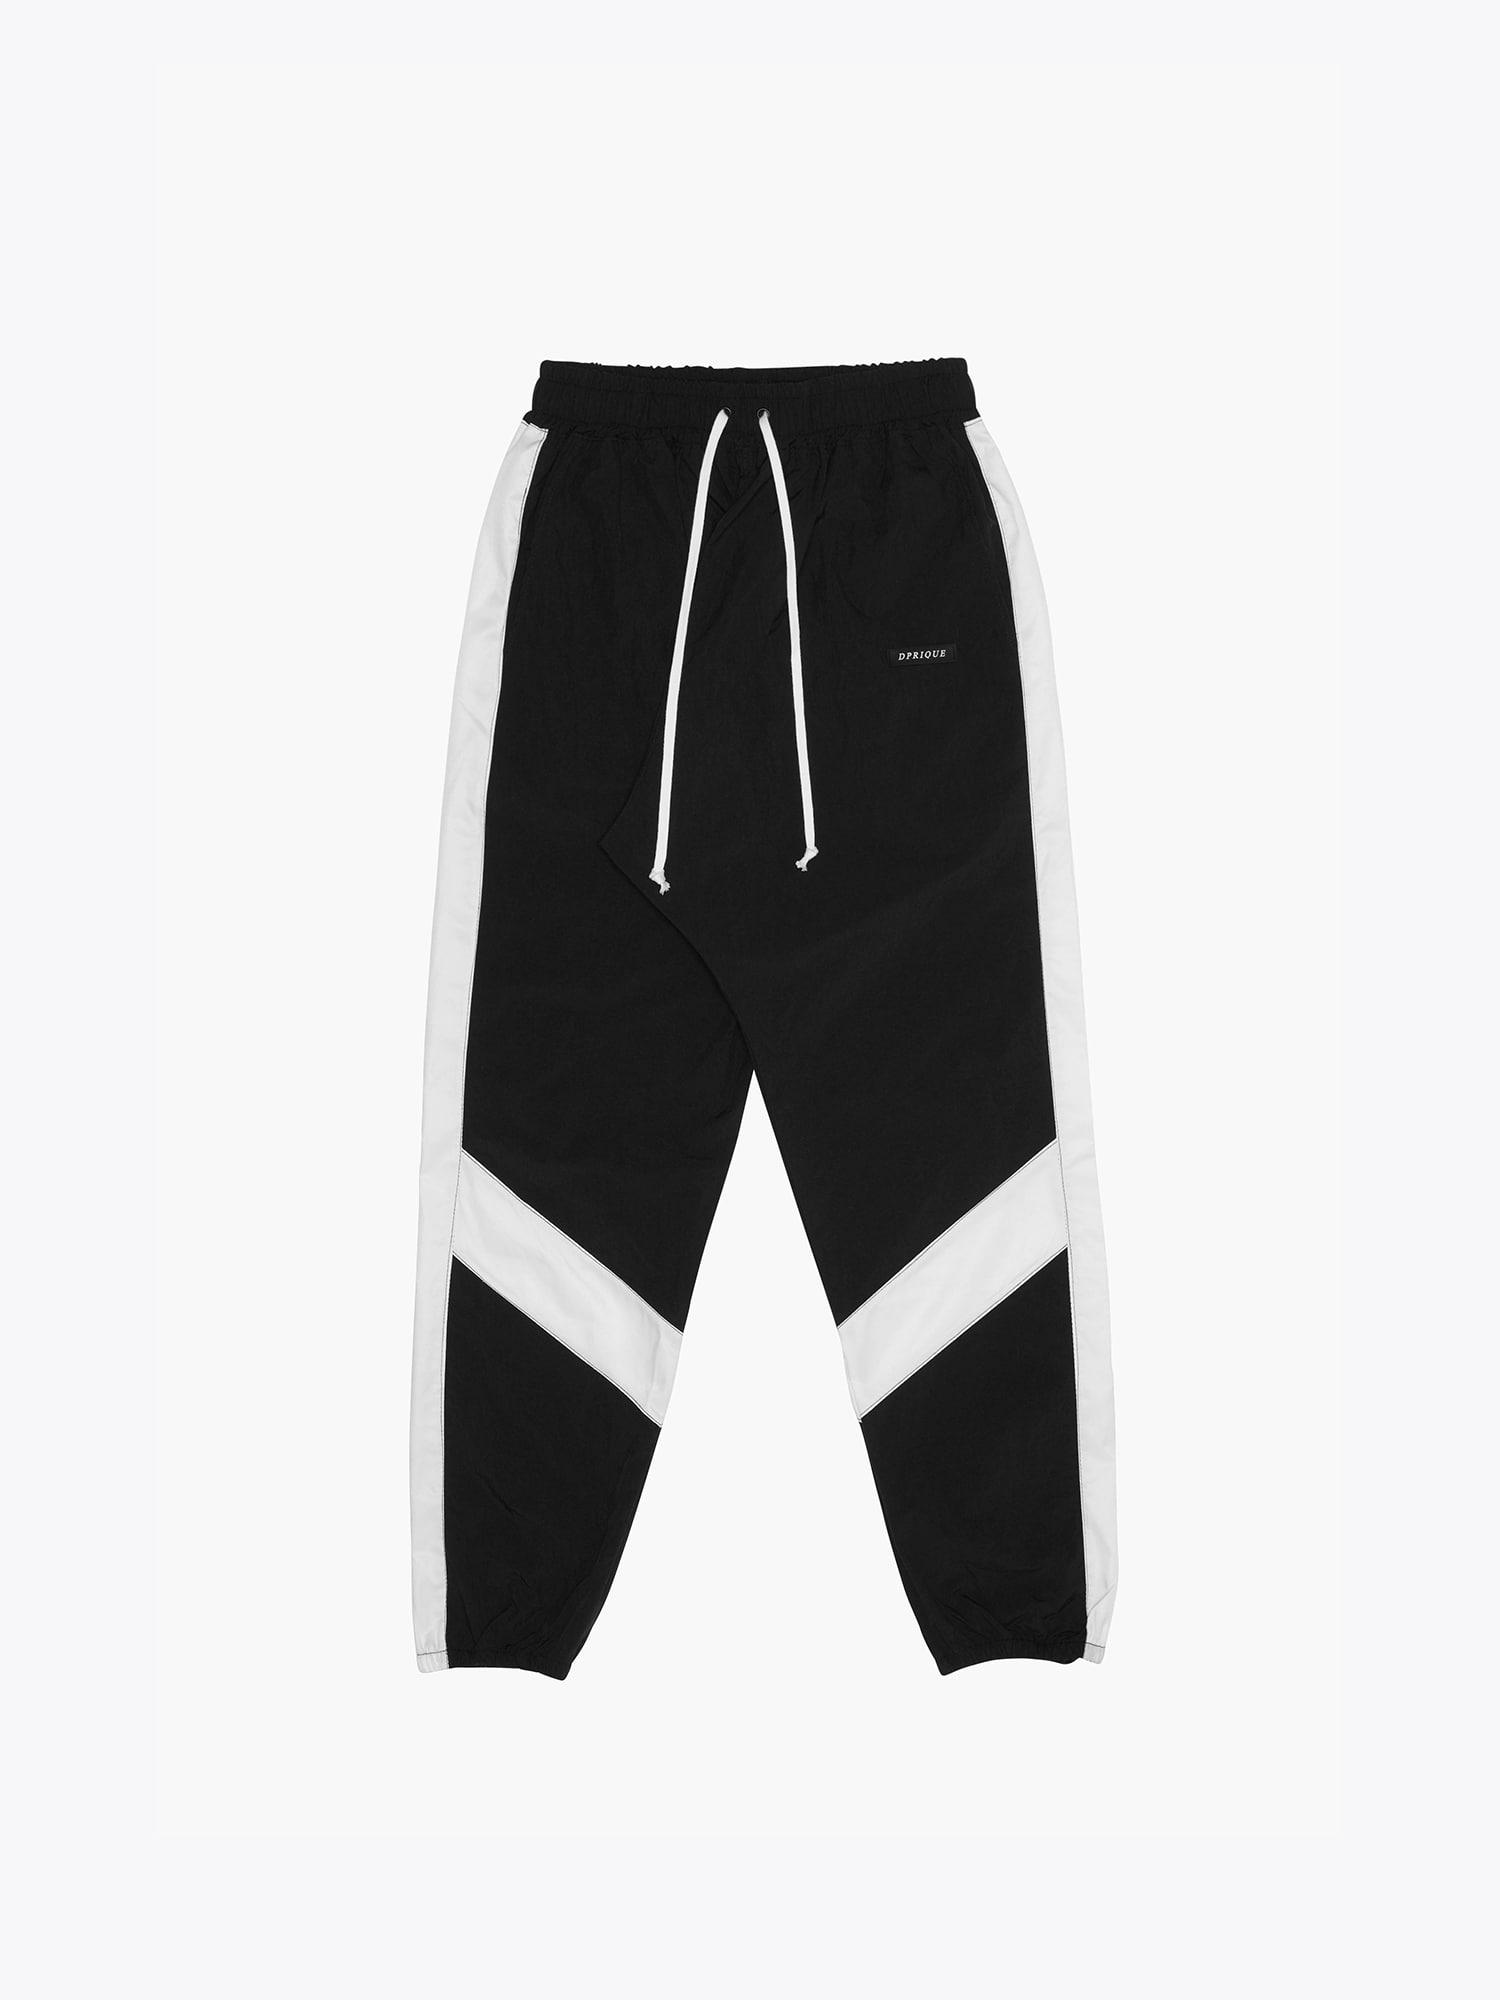 Contrast Track Pants Black/White